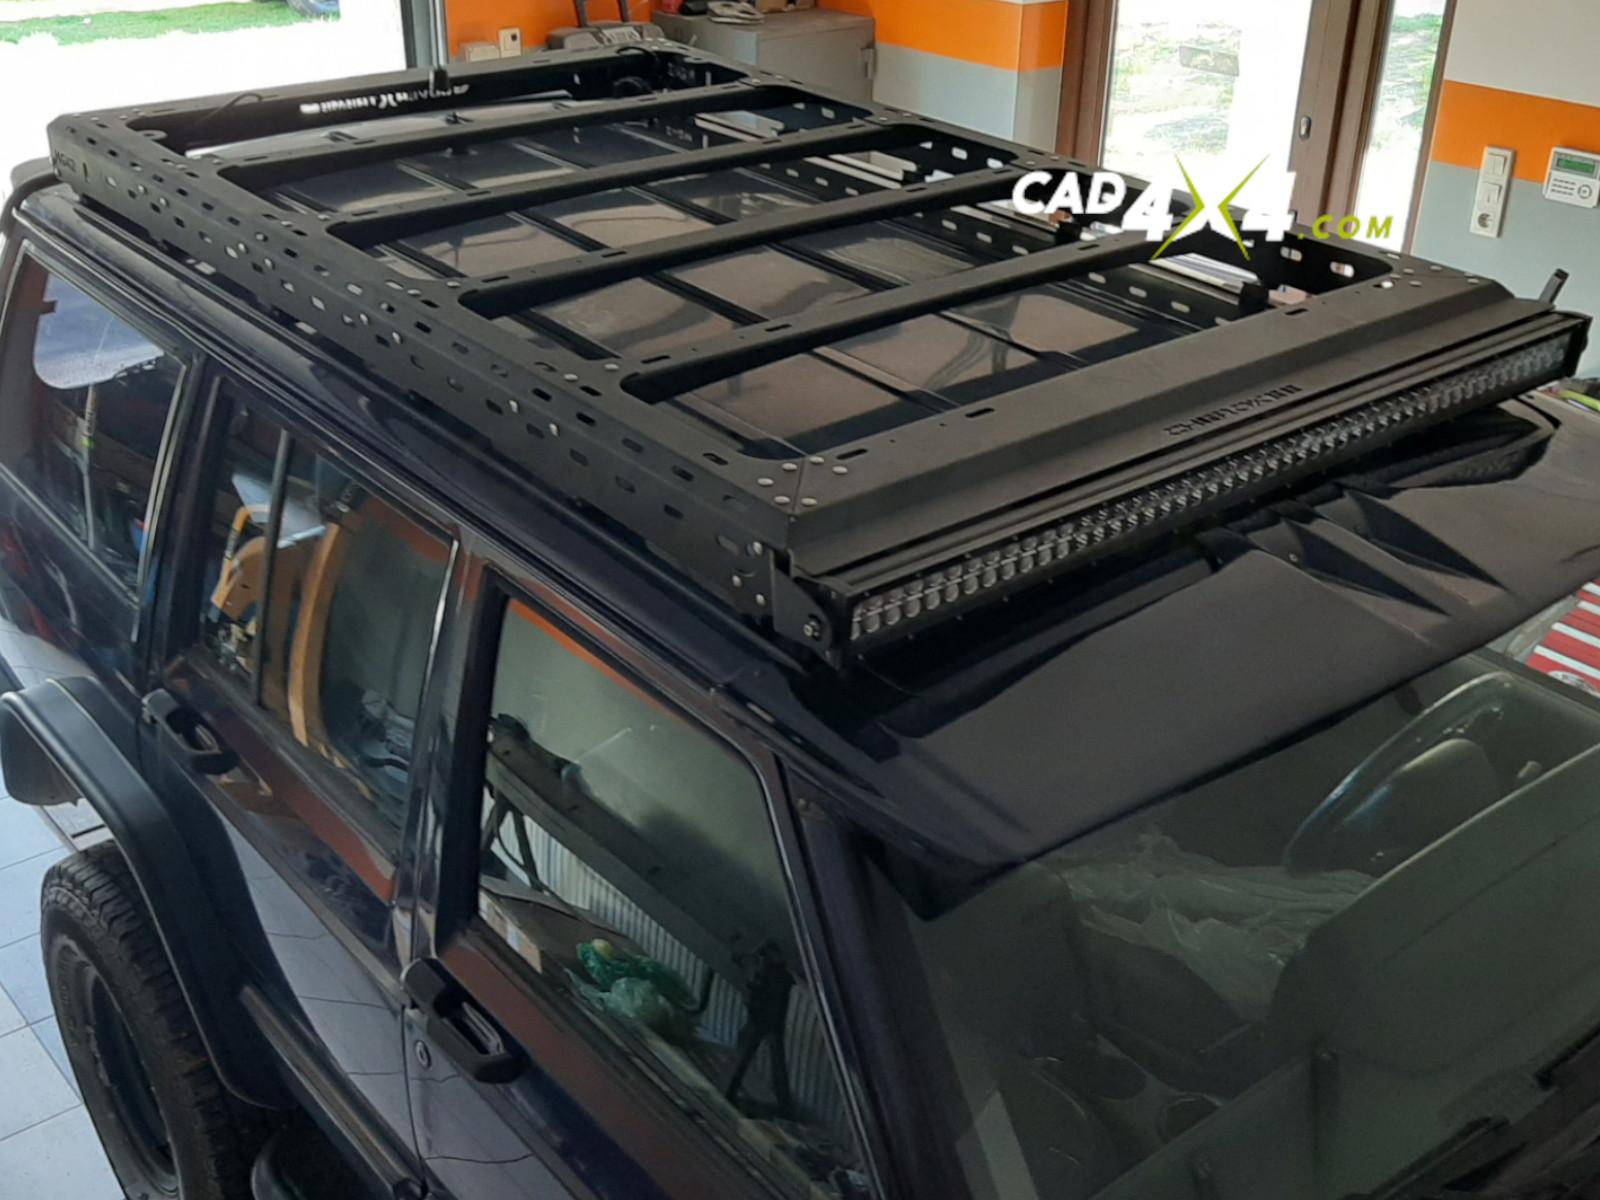 Jeep Cherokee XJ roof rack - CAD 4×4 Store